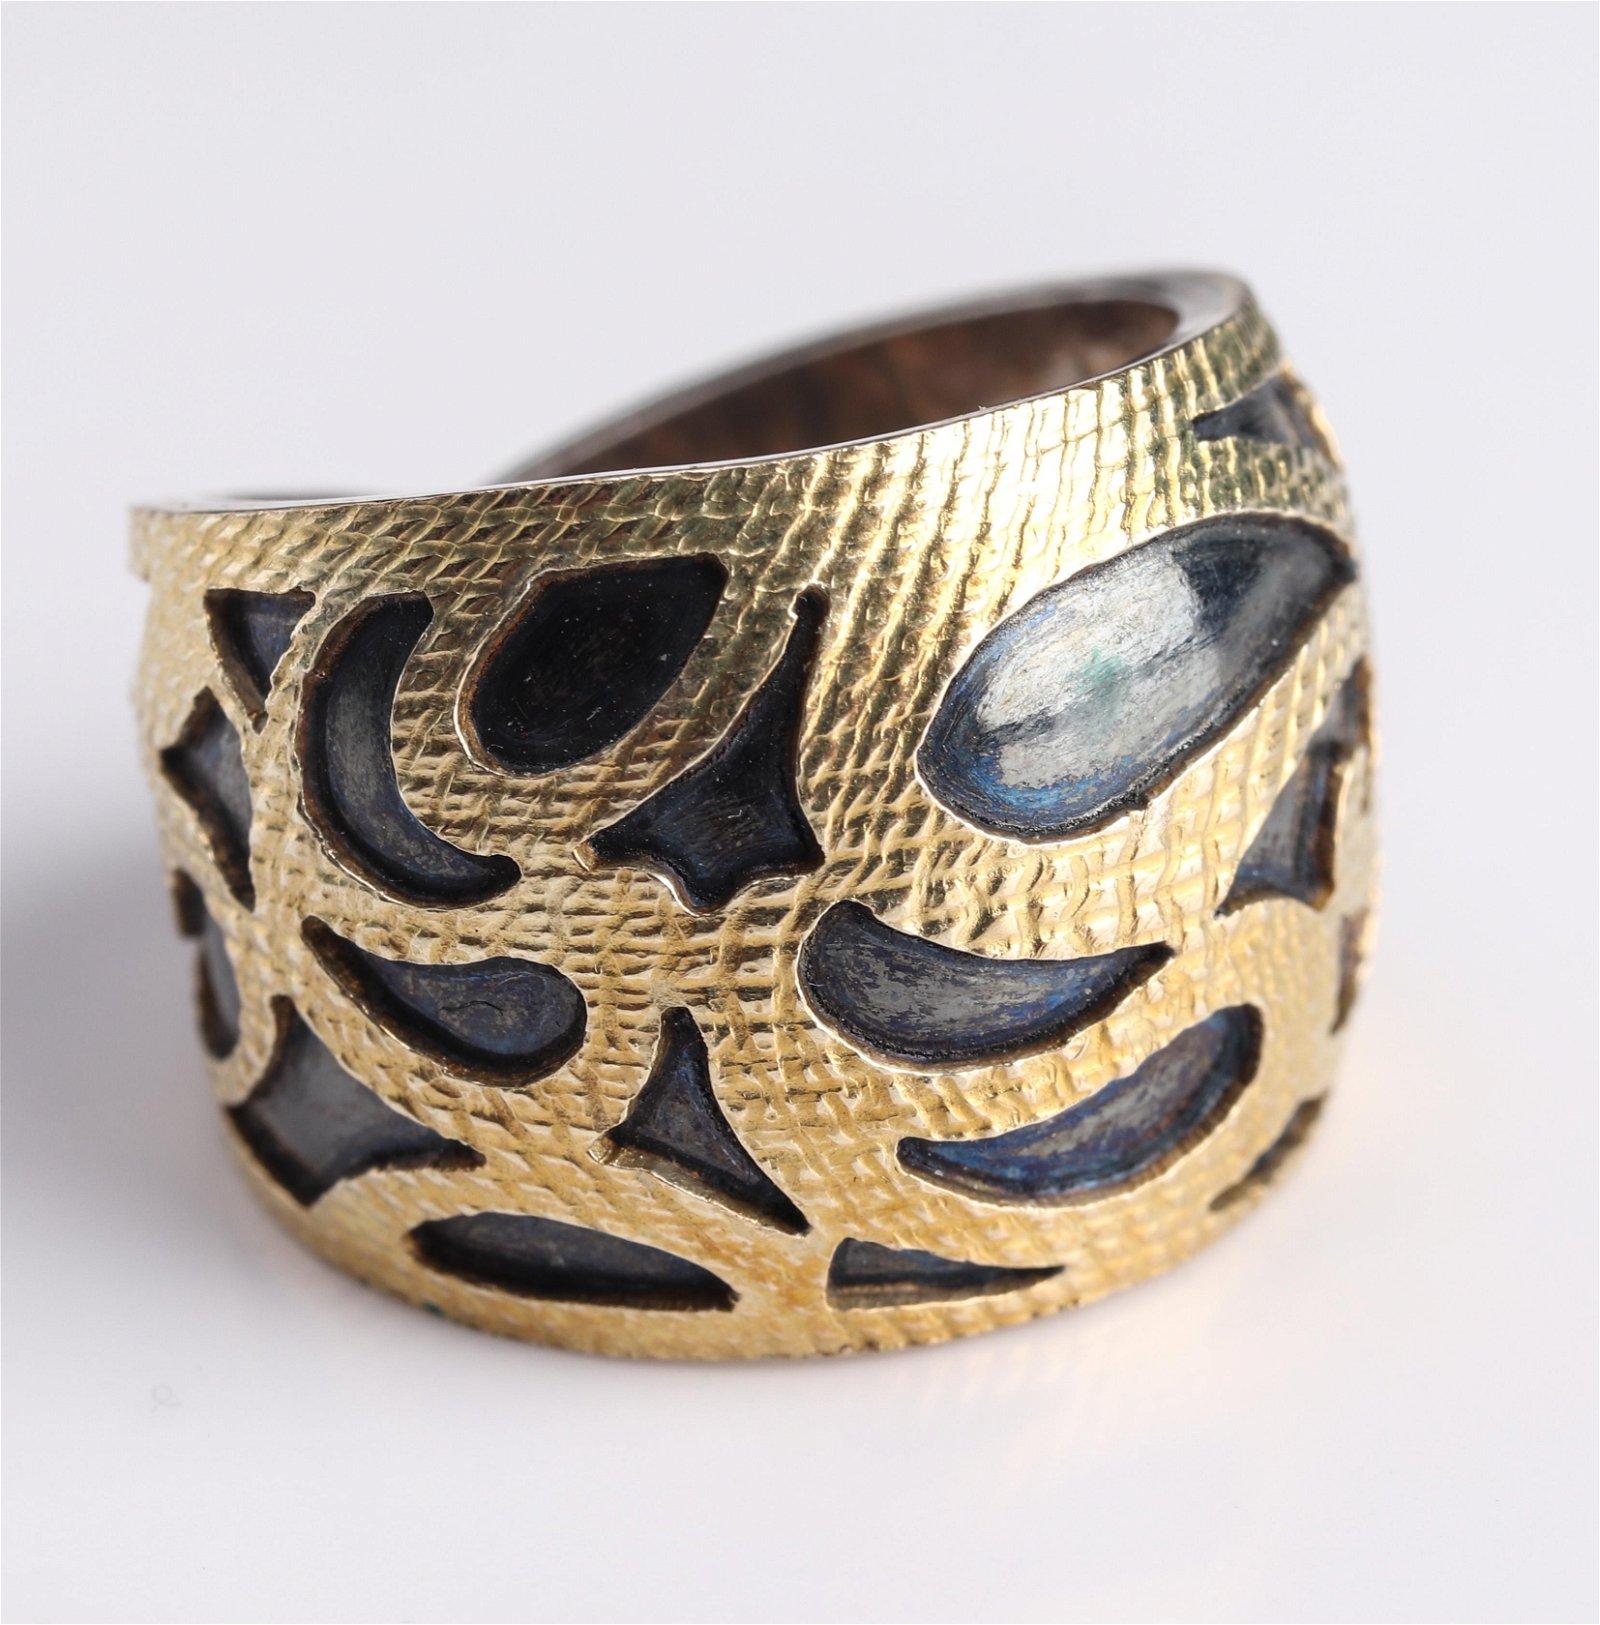 Blackened Silver & 18K Yellow Gold Ornate Ring